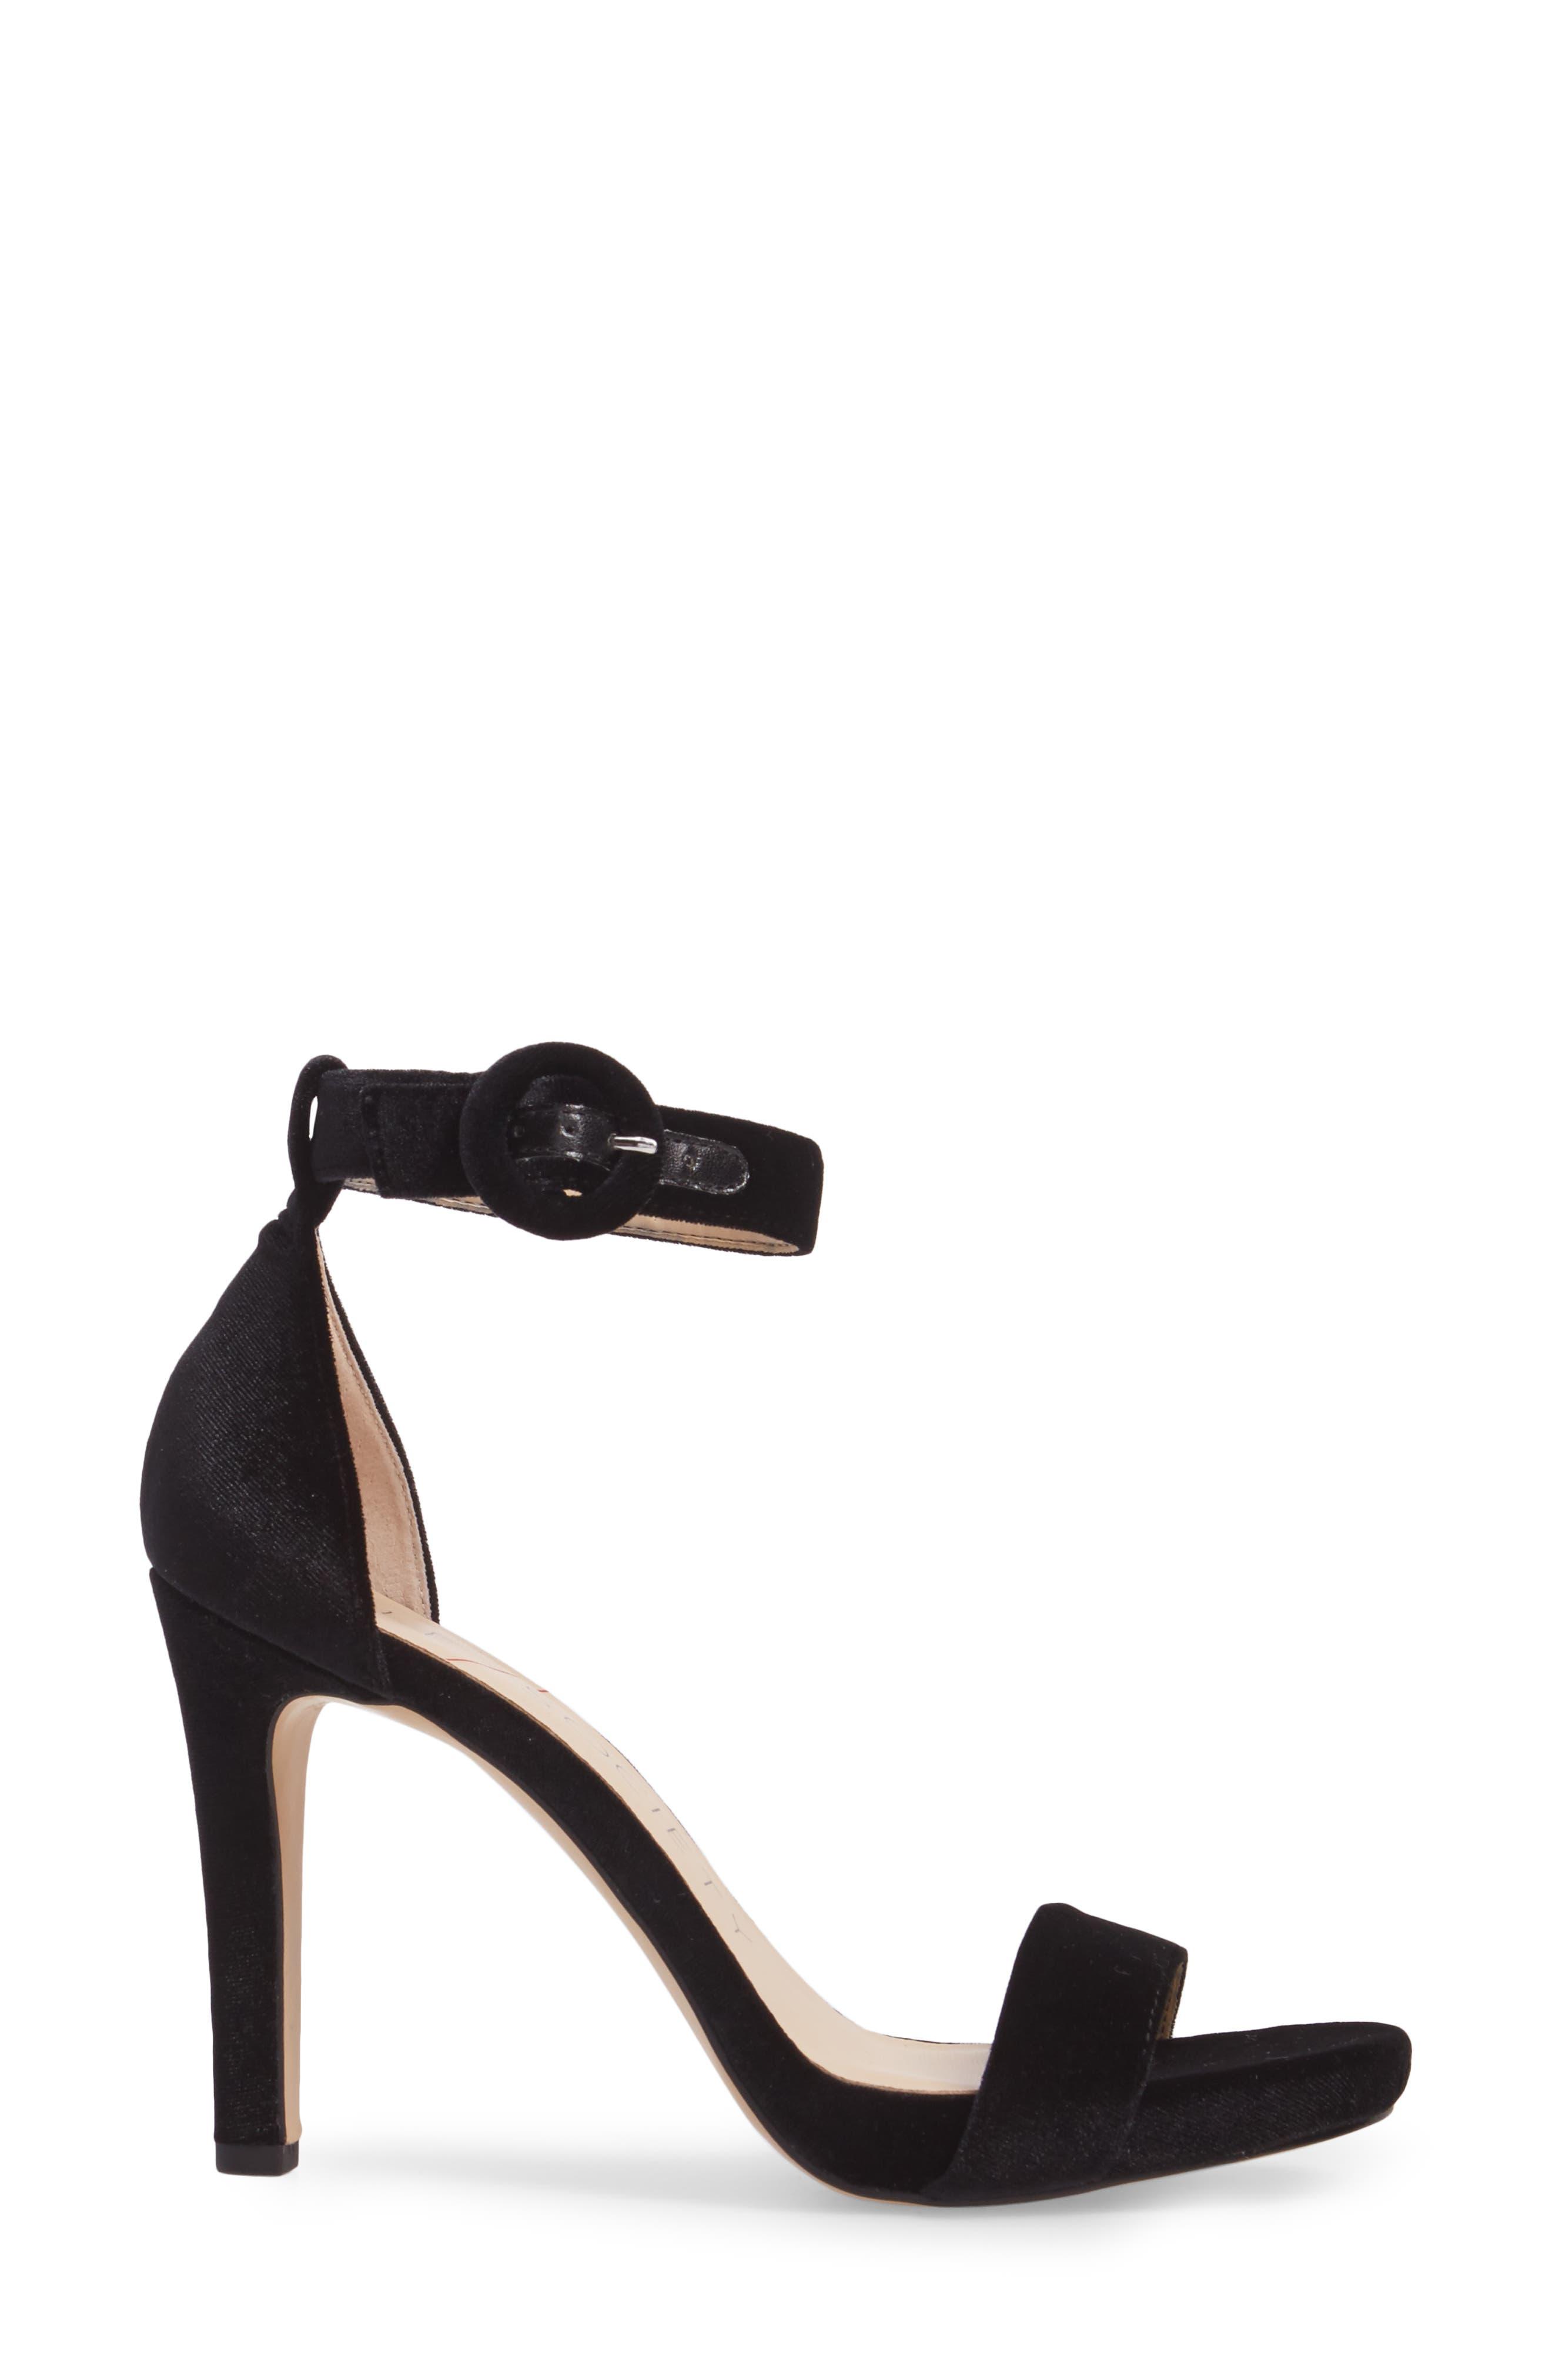 Emelia Ankle Strap Sandal,                             Alternate thumbnail 3, color,                             001